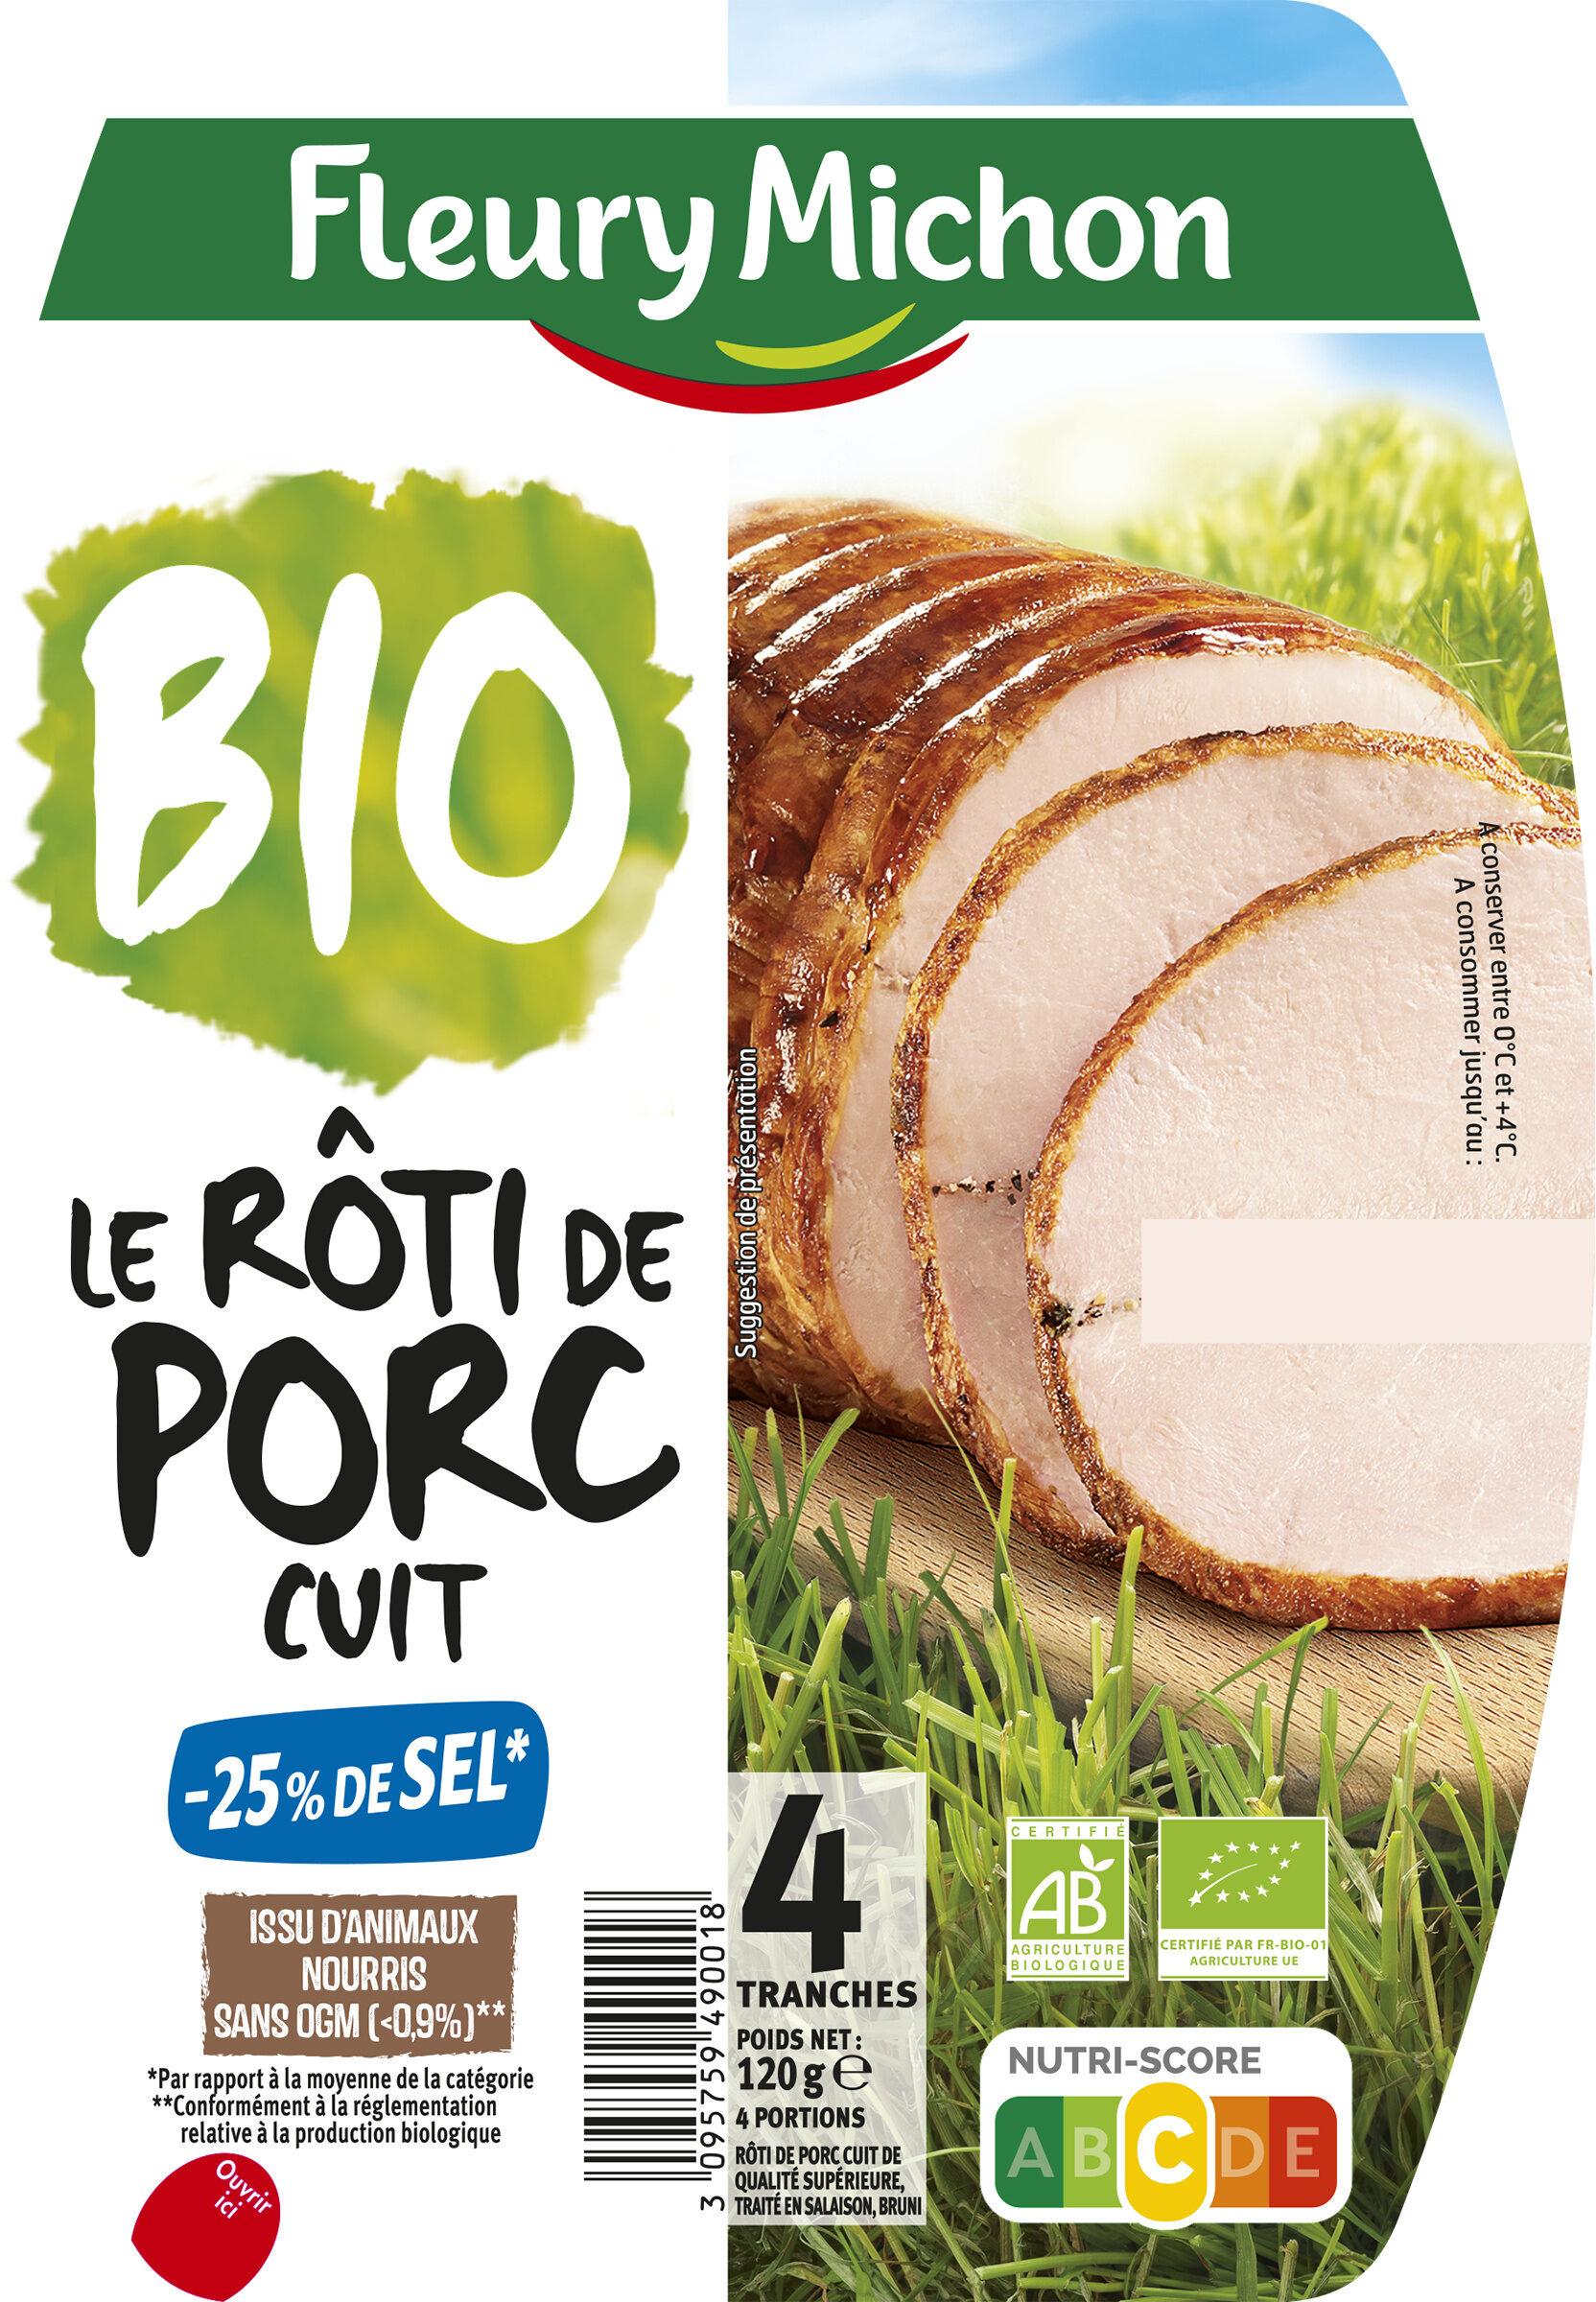 Rôti de porc cuit BIO -25% de sel* - 4 tranches - Product - fr